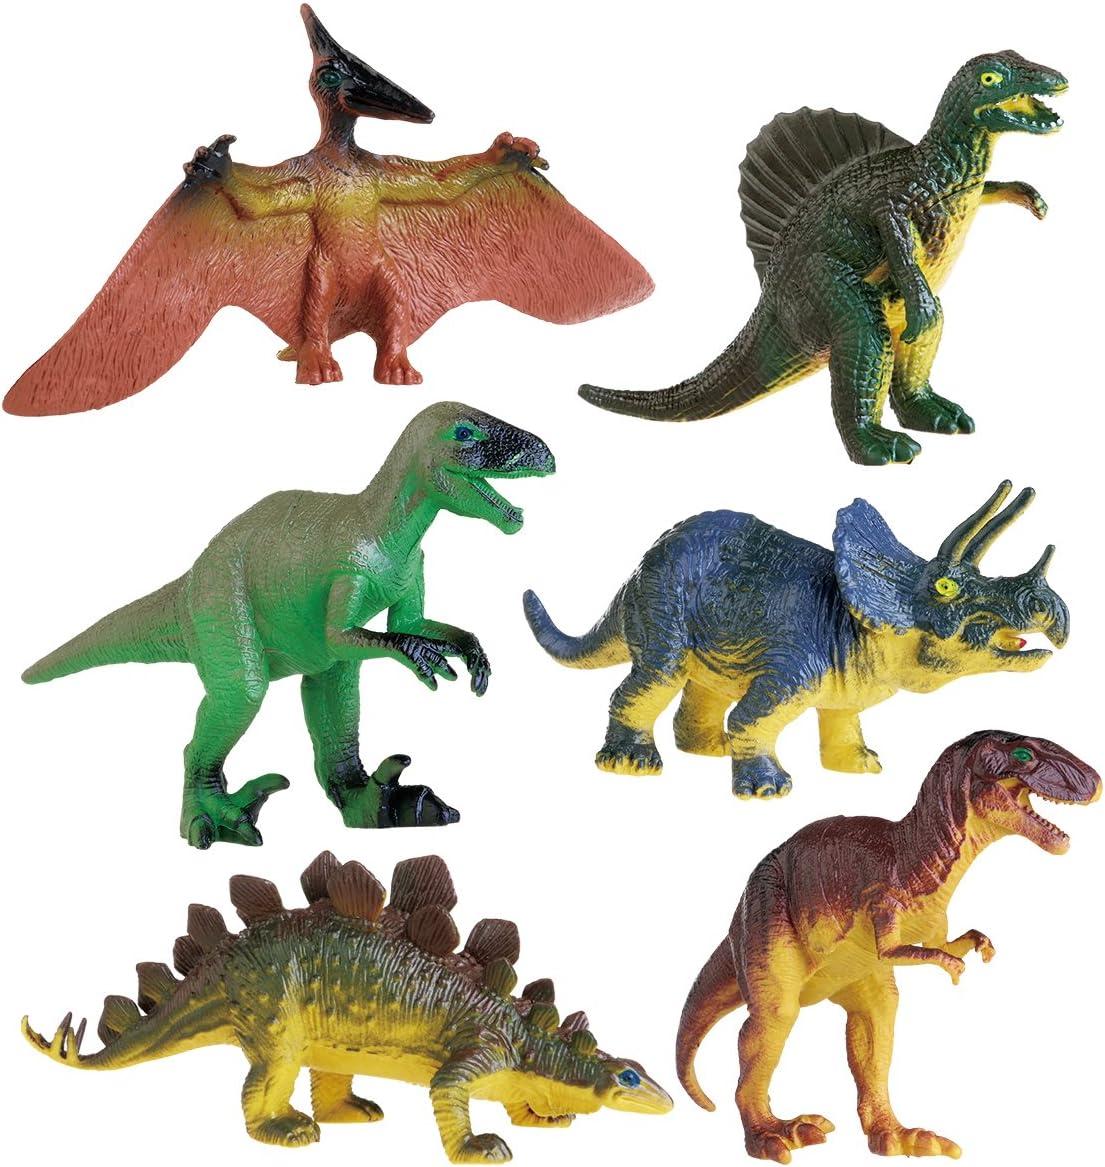 NUOLUX 6pcs Dinosaurio Tirannosaurus Stegosaurus Triceratops Utahraptor peterosaurio Spinosaurus juguete educativo